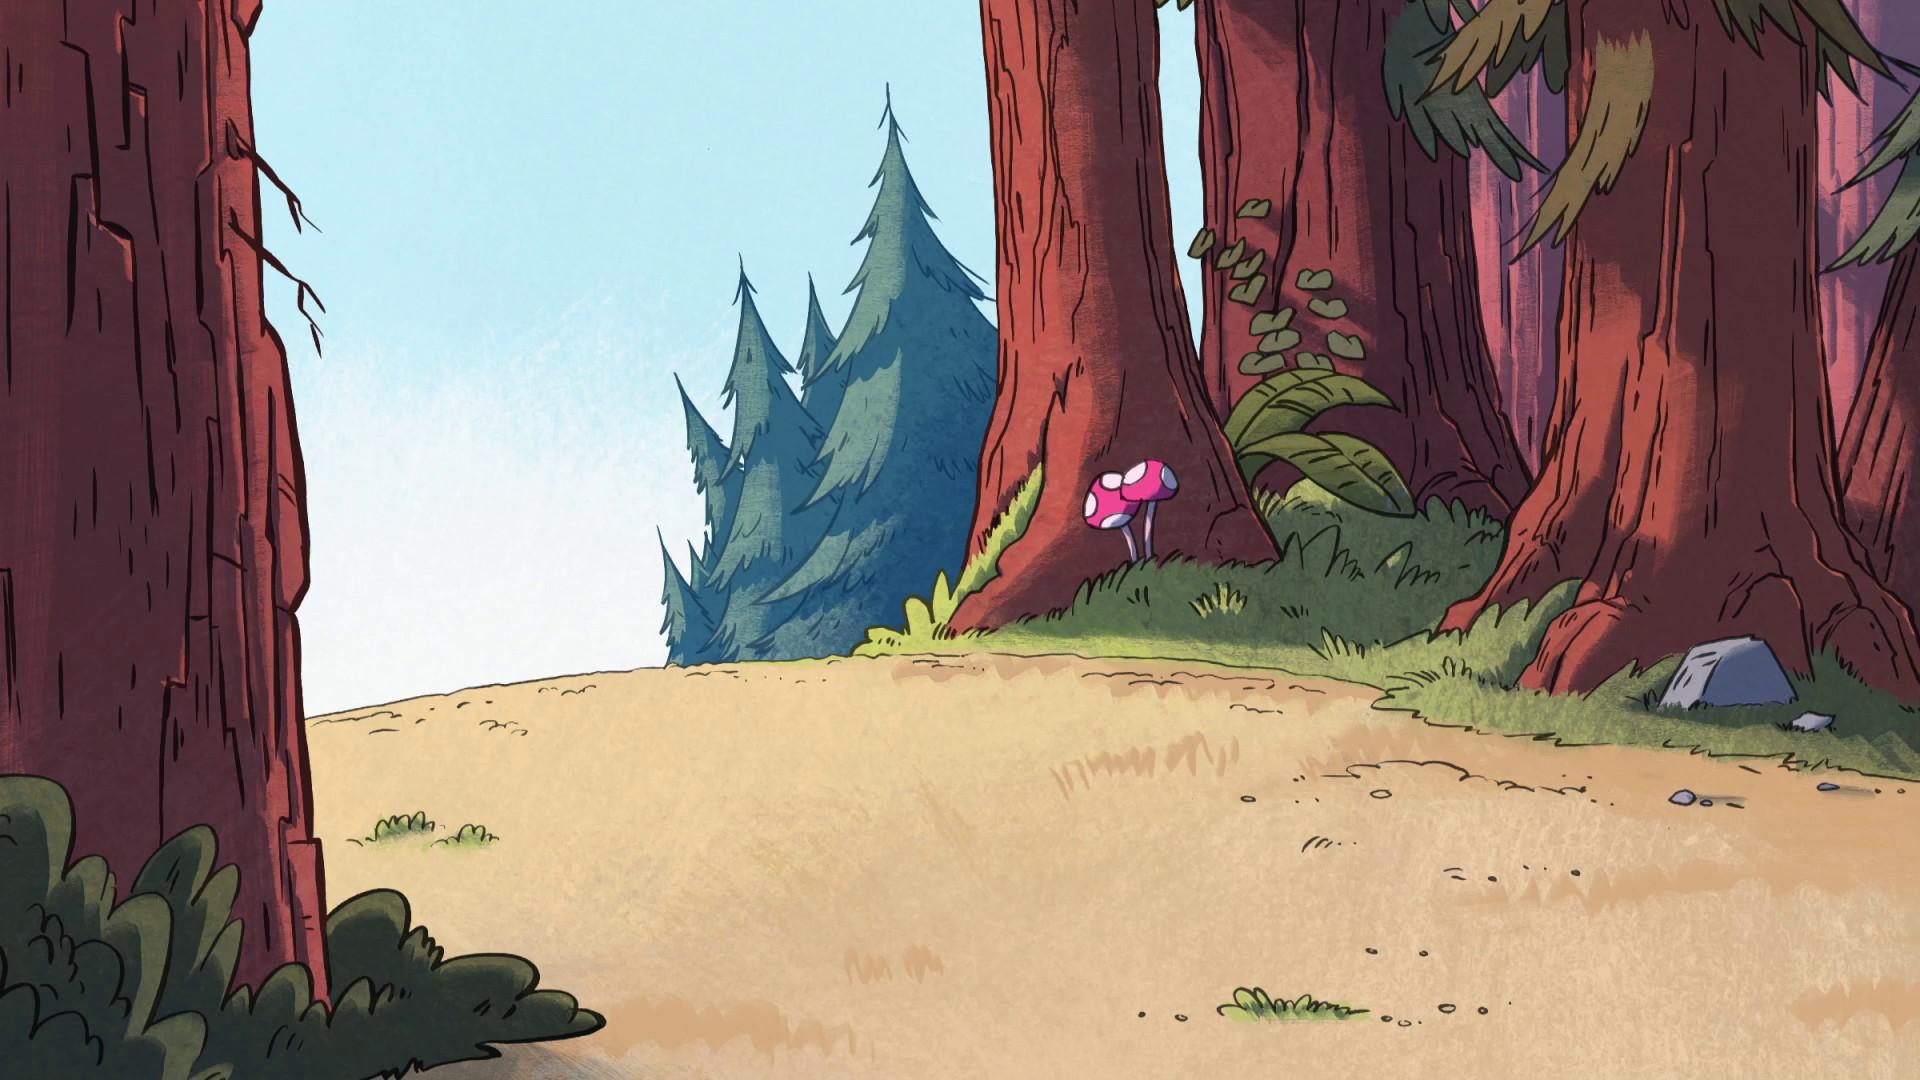 Fall Desktop Wallpaper Widescreen Free 59 Gravity Falls Backgrounds 183 ① Download Free Amazing Hd